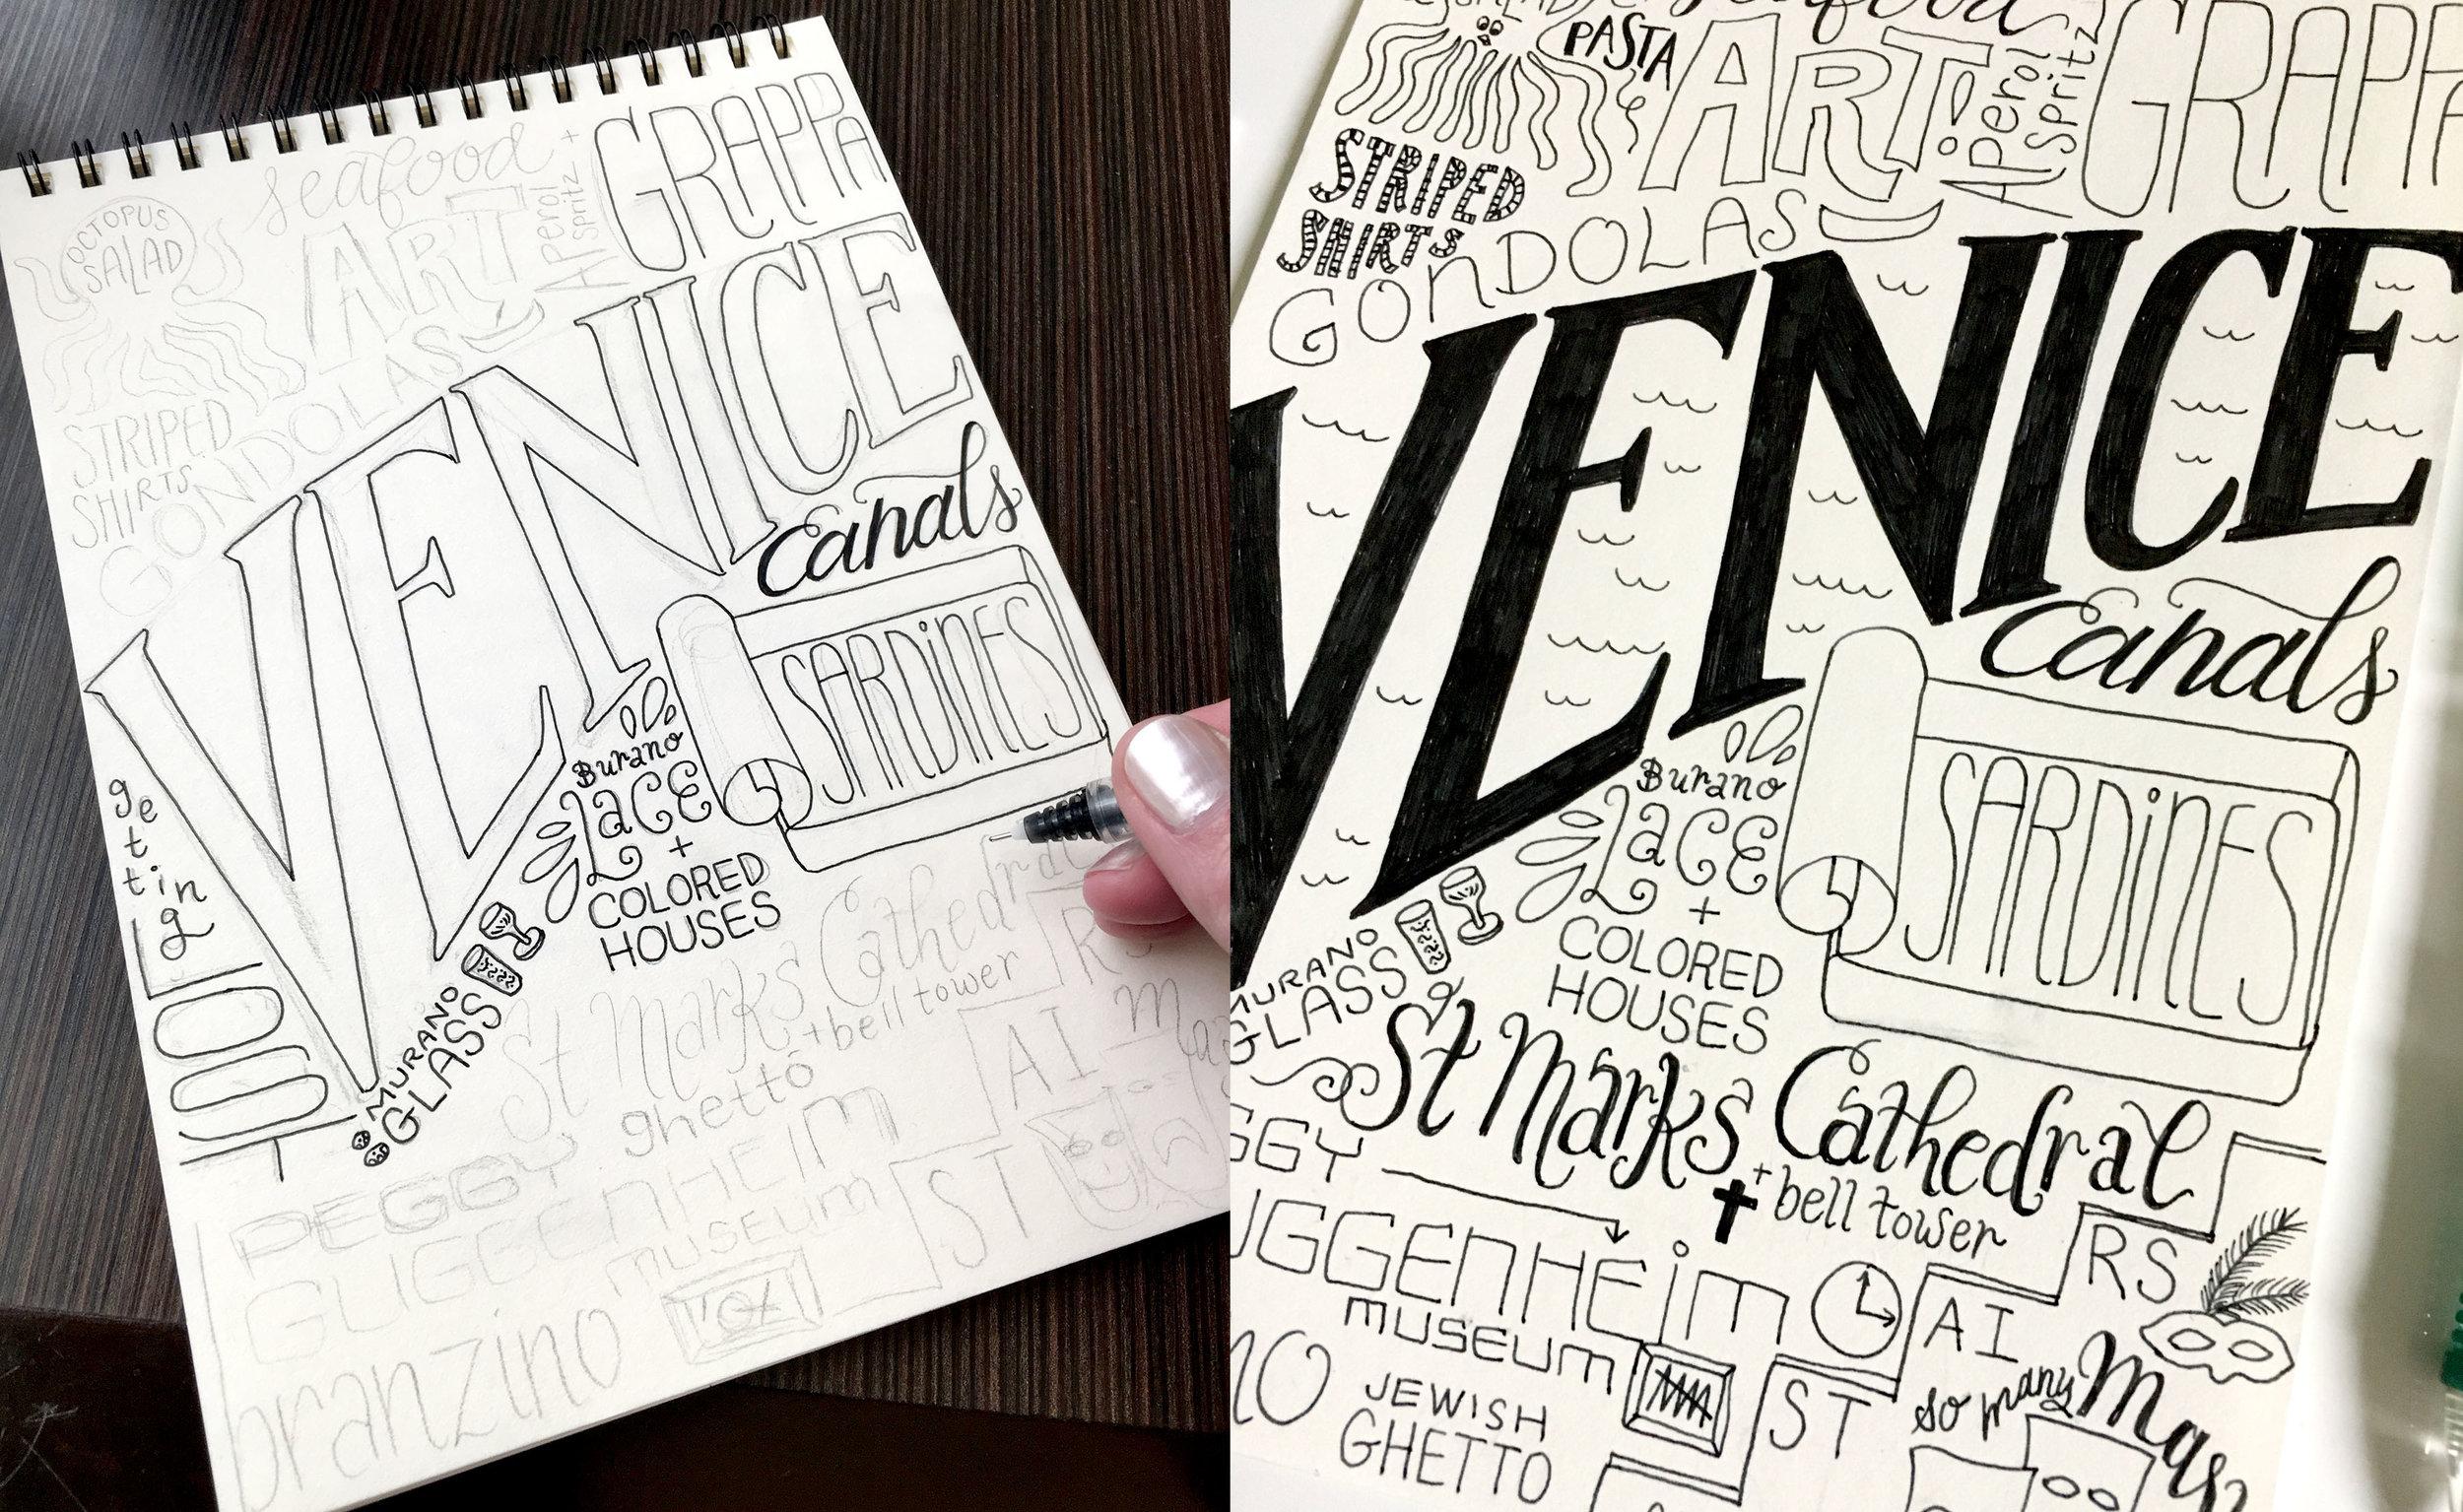 Venice sketches in progress…